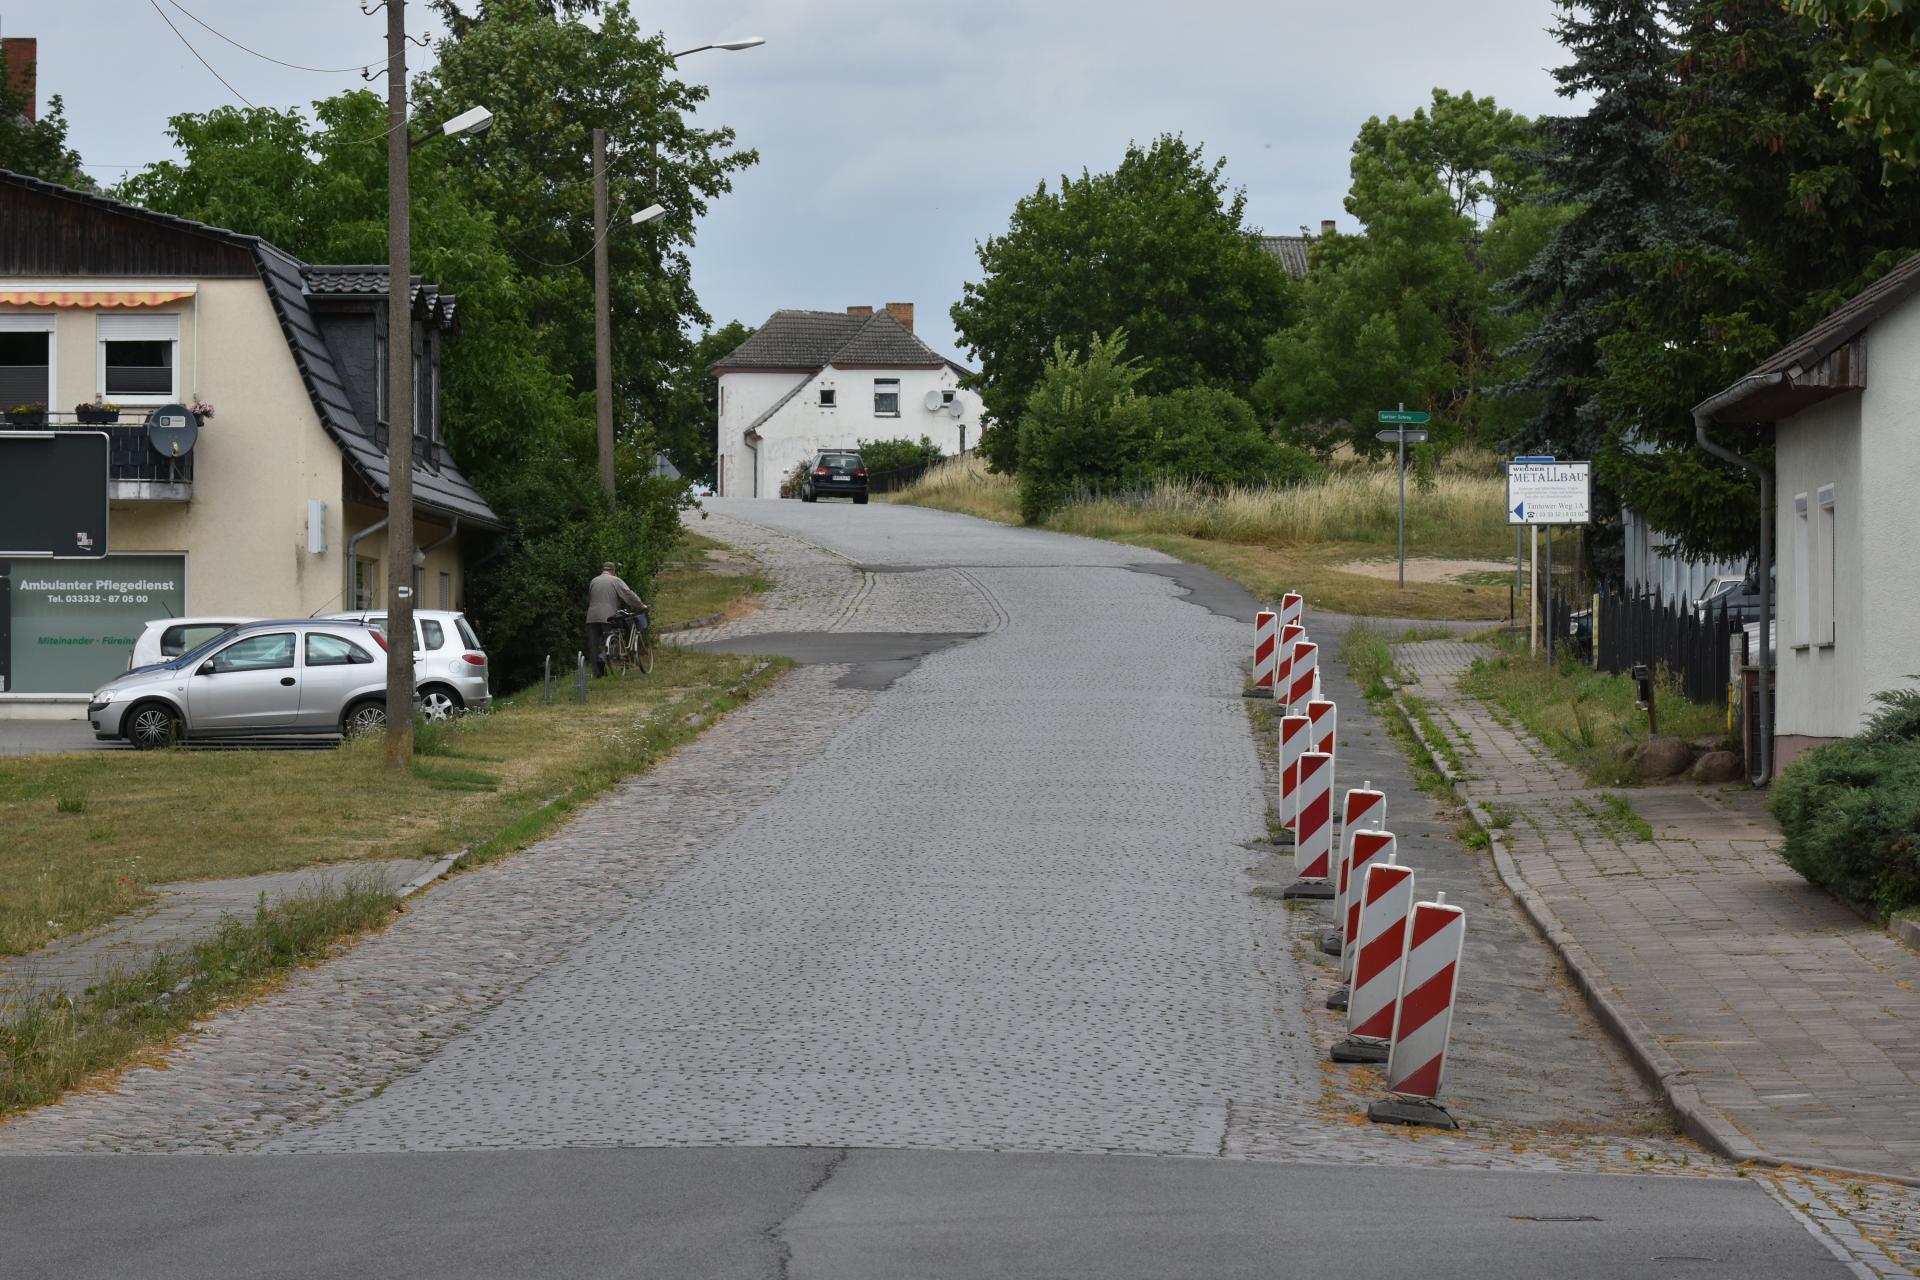 Ortsdurchfahrt Gartz (Oder)